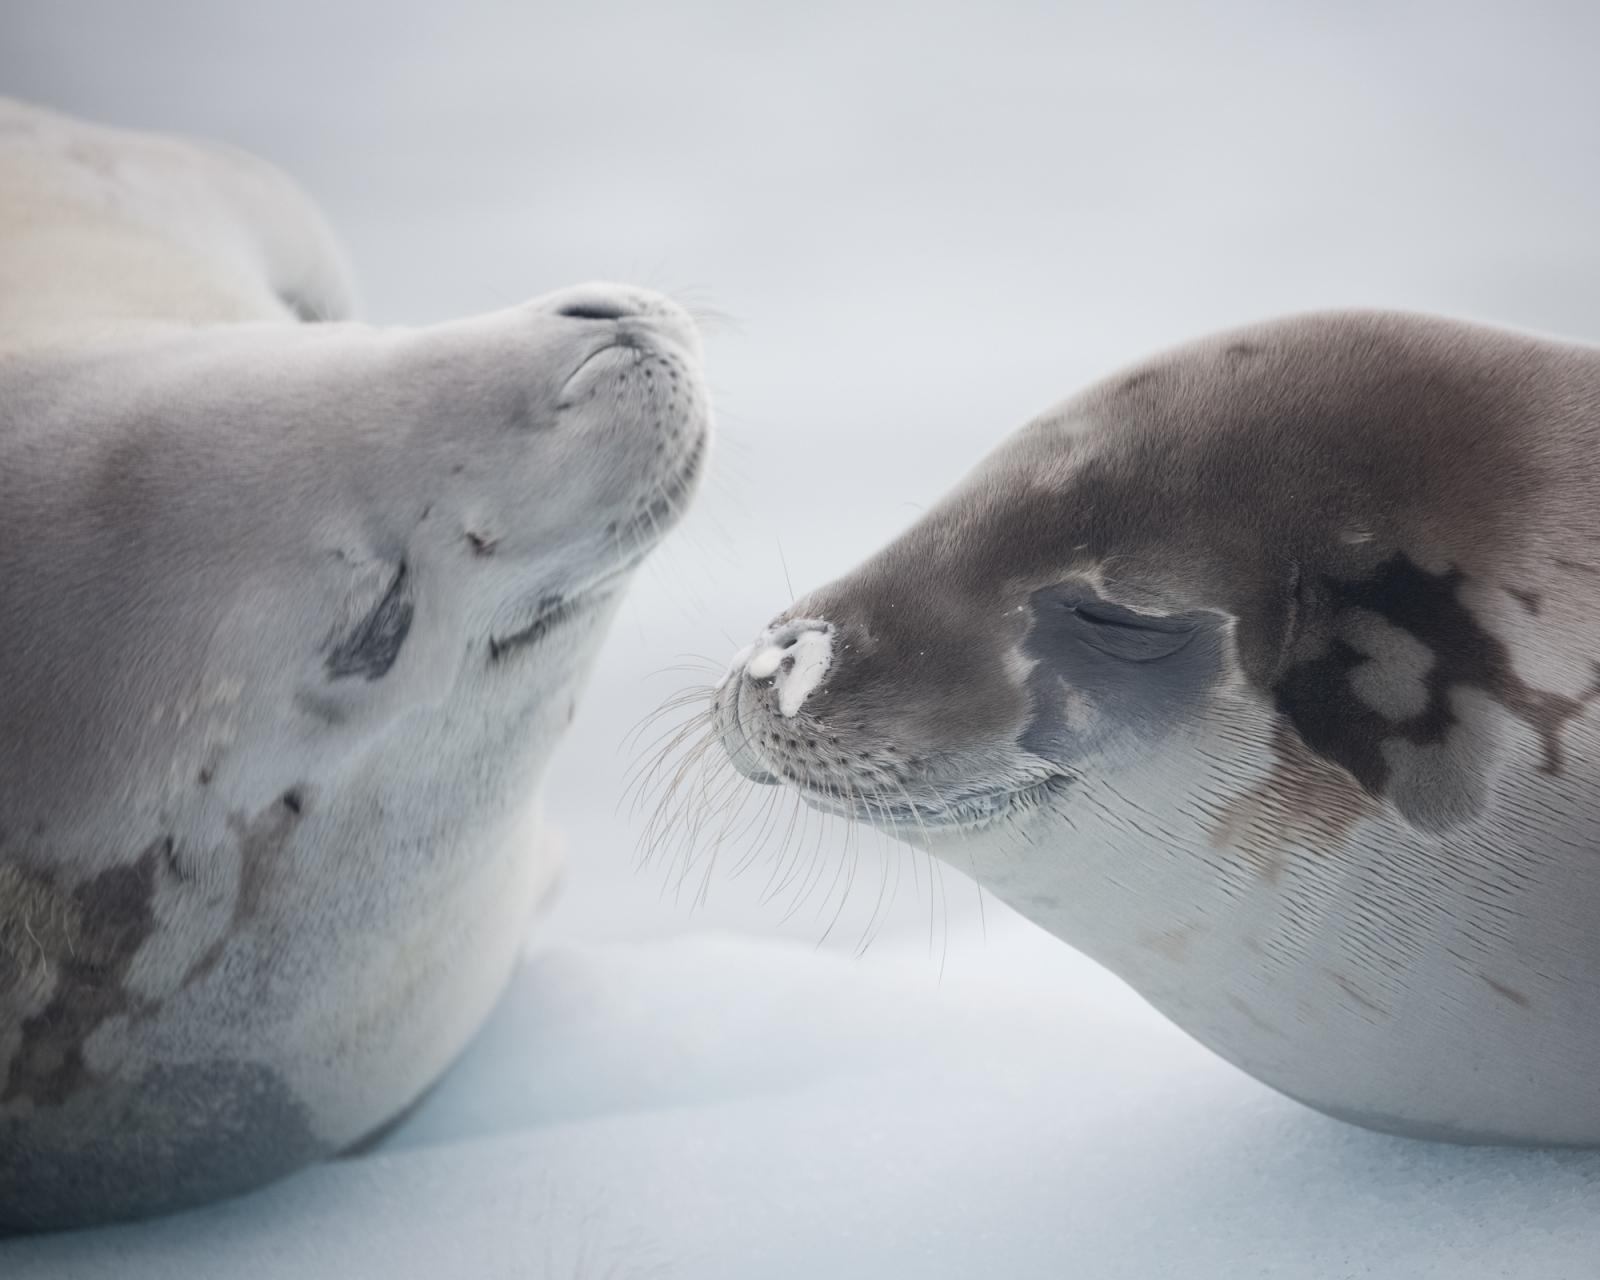 Art and Documentary Photography - Loading 0_Antarctica_UPLOAD_acaciajohnson_6.jpg